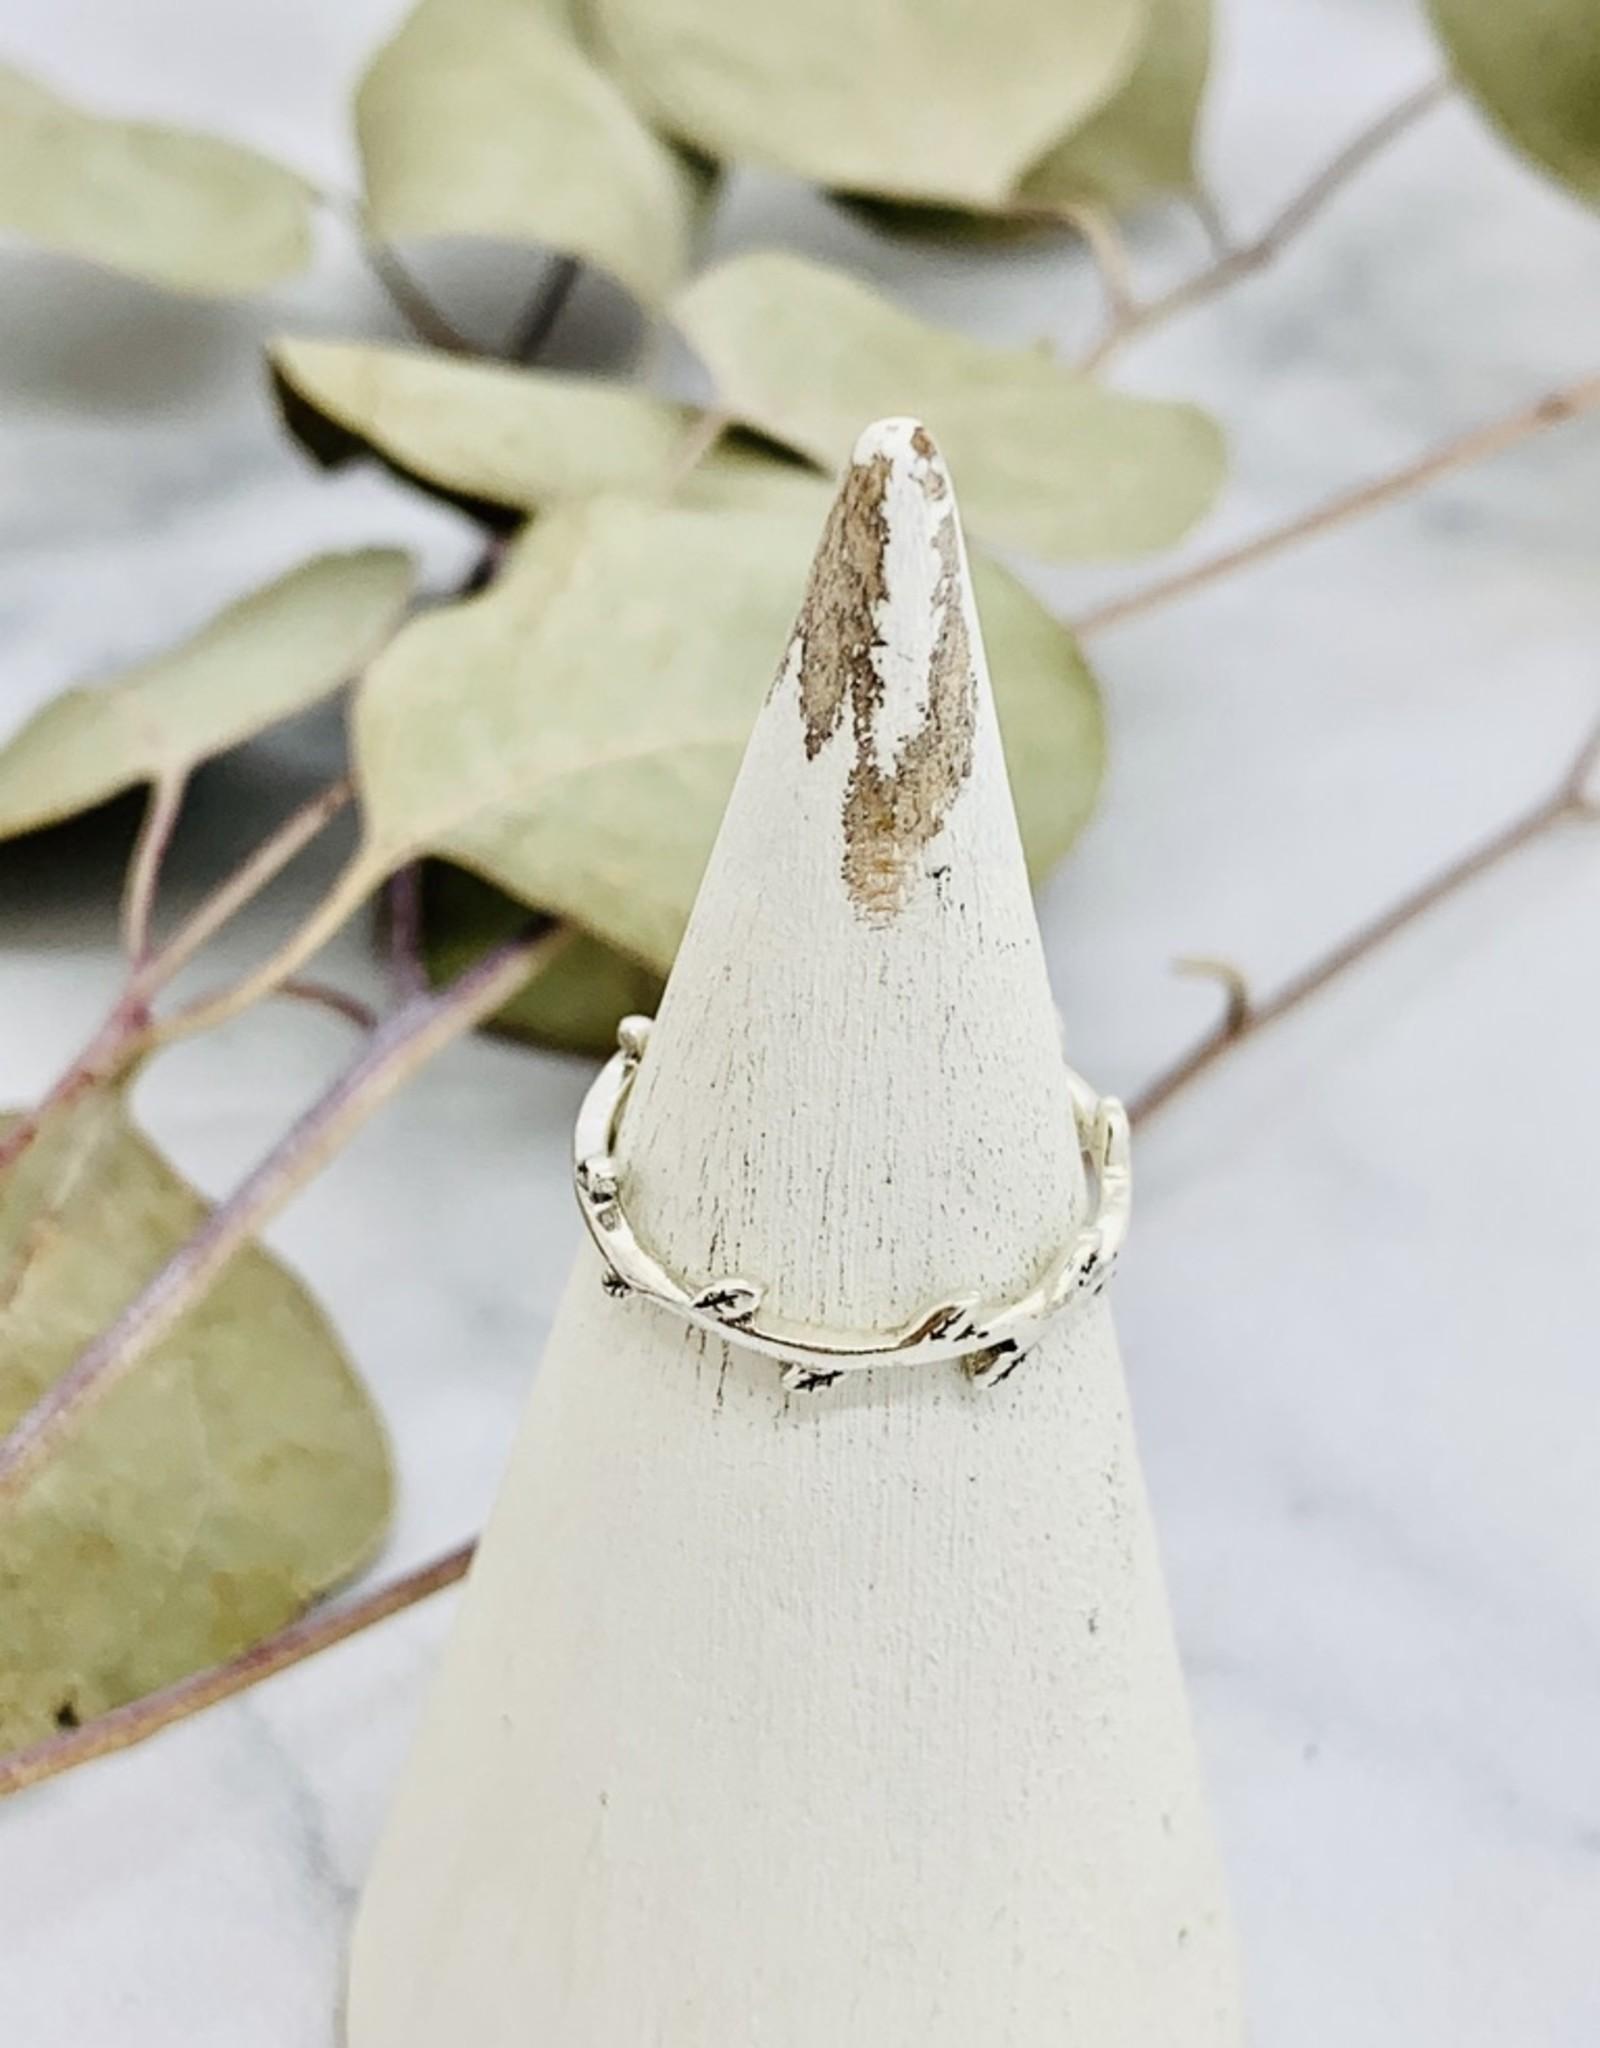 Tiny Alternating Leaves Ring